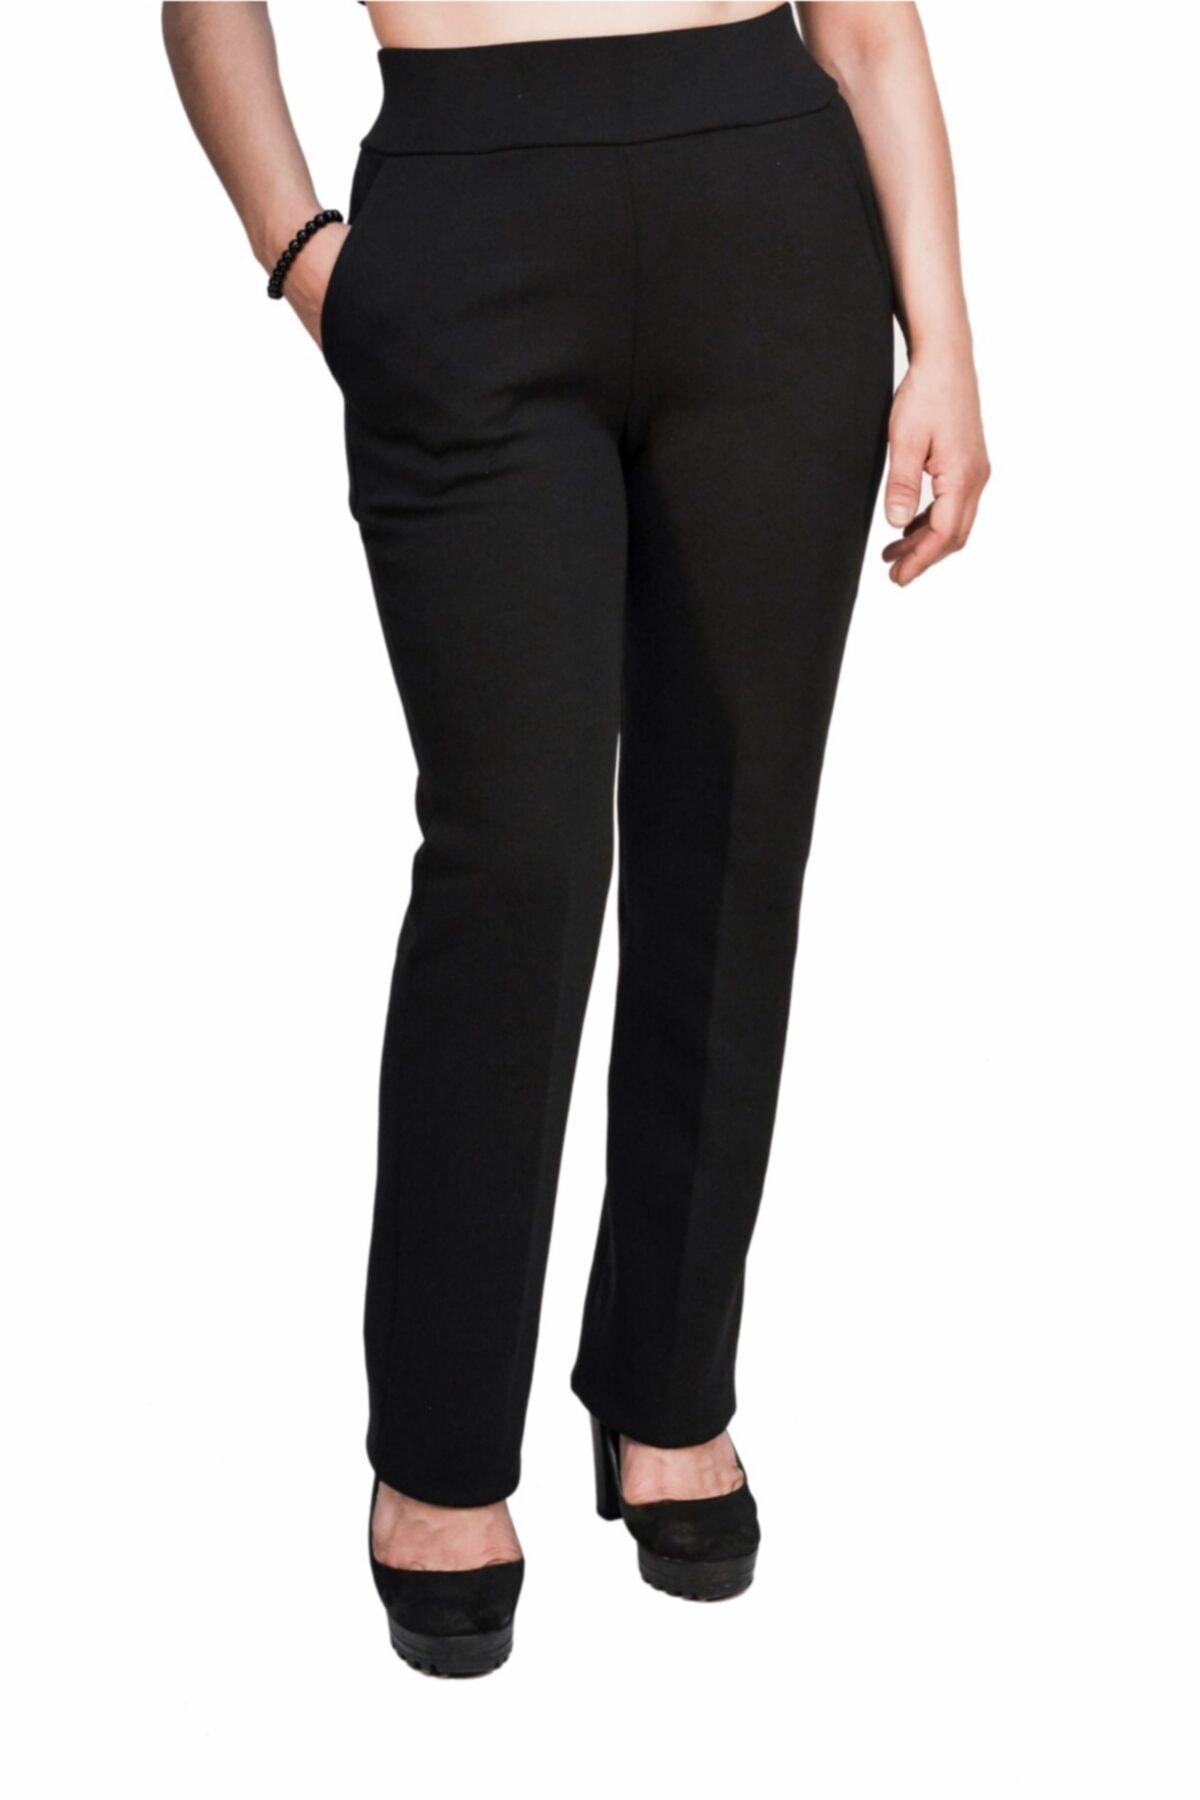 Otto Kadın Siyah Klasik Yüksek Kemer Dar Paça Pantalon 1